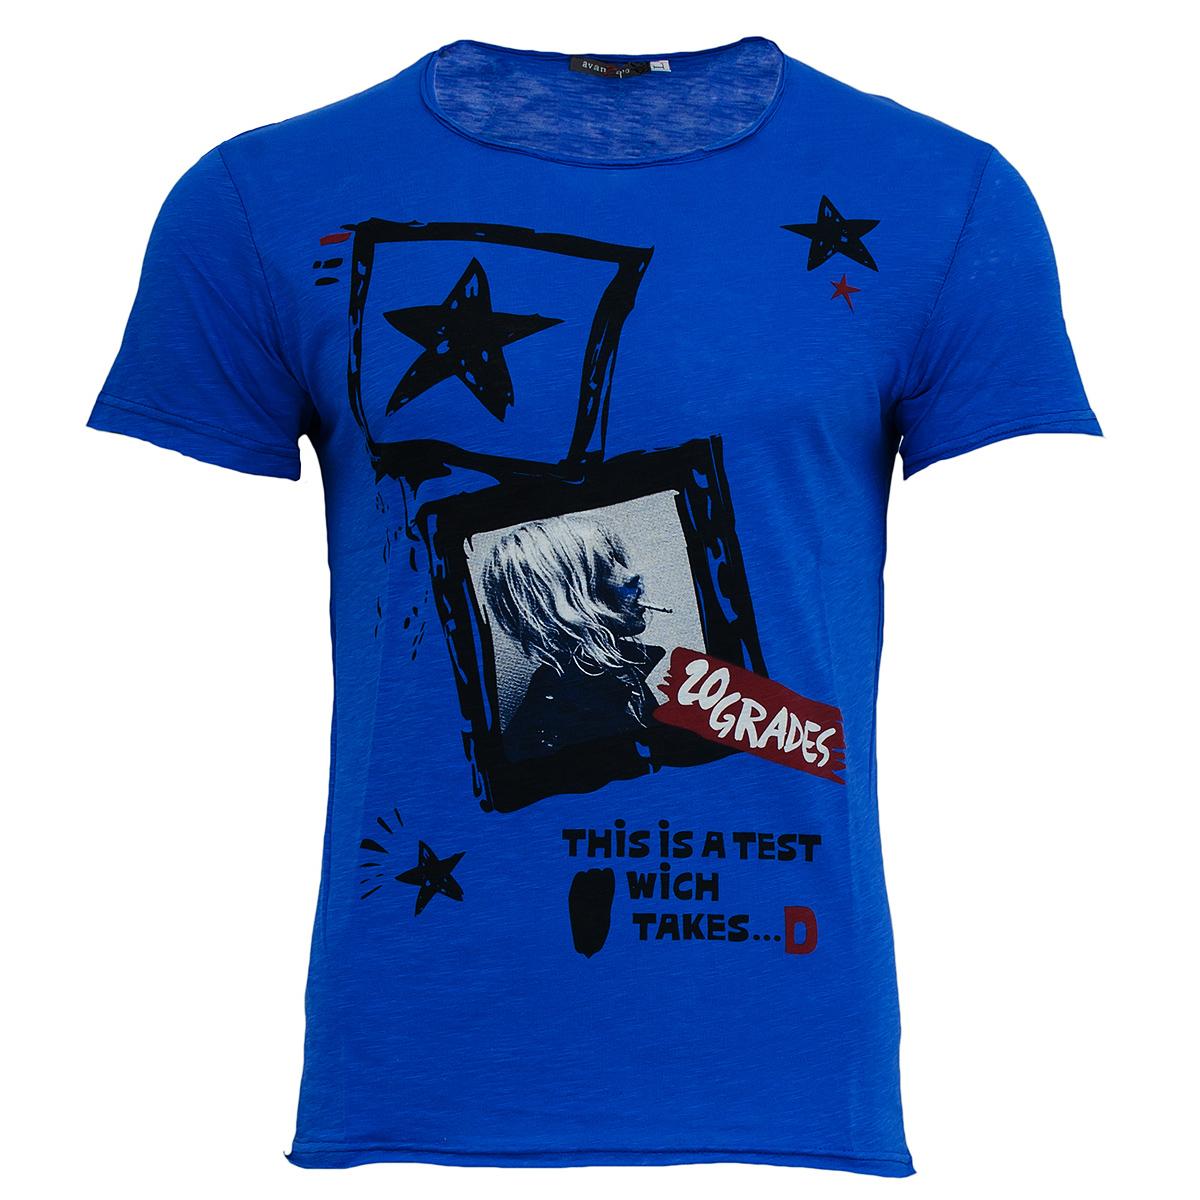 Aνδρικό Τ-shirt 20 Grades-Μπλε αρχική ανδρικά ρούχα μπουφάν